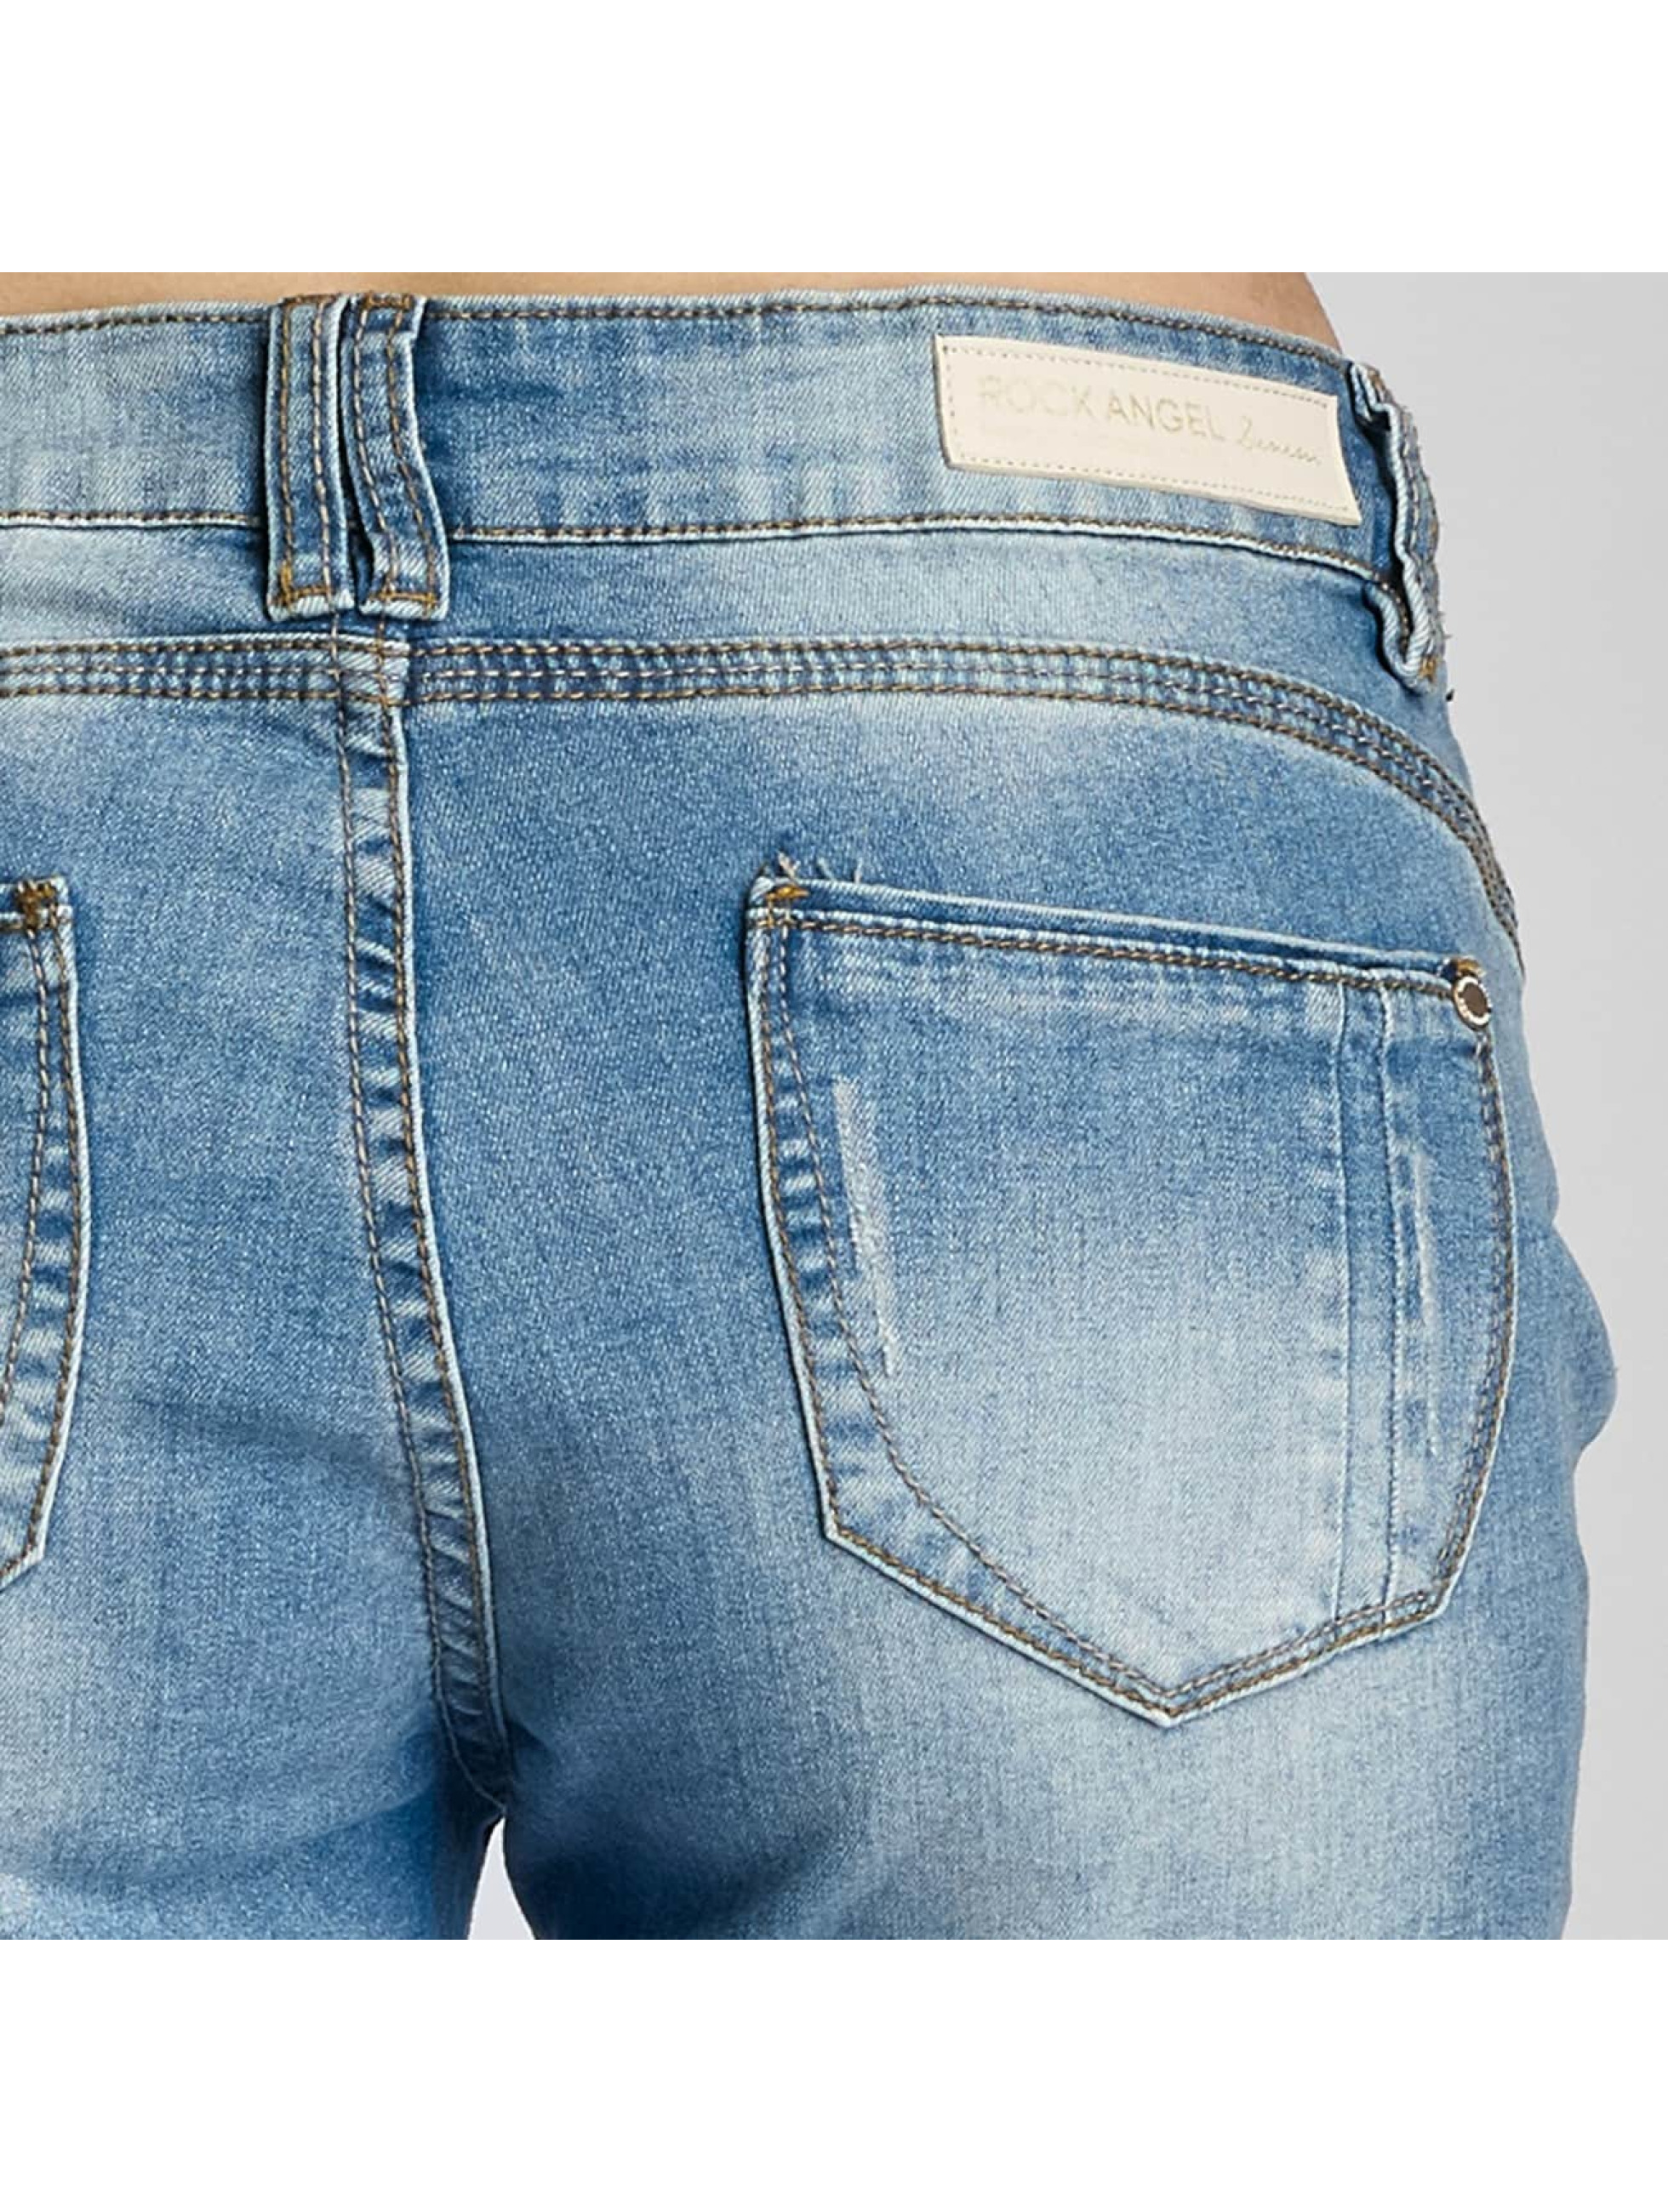 Rock Angel Pantalón cortos Charlotta azul